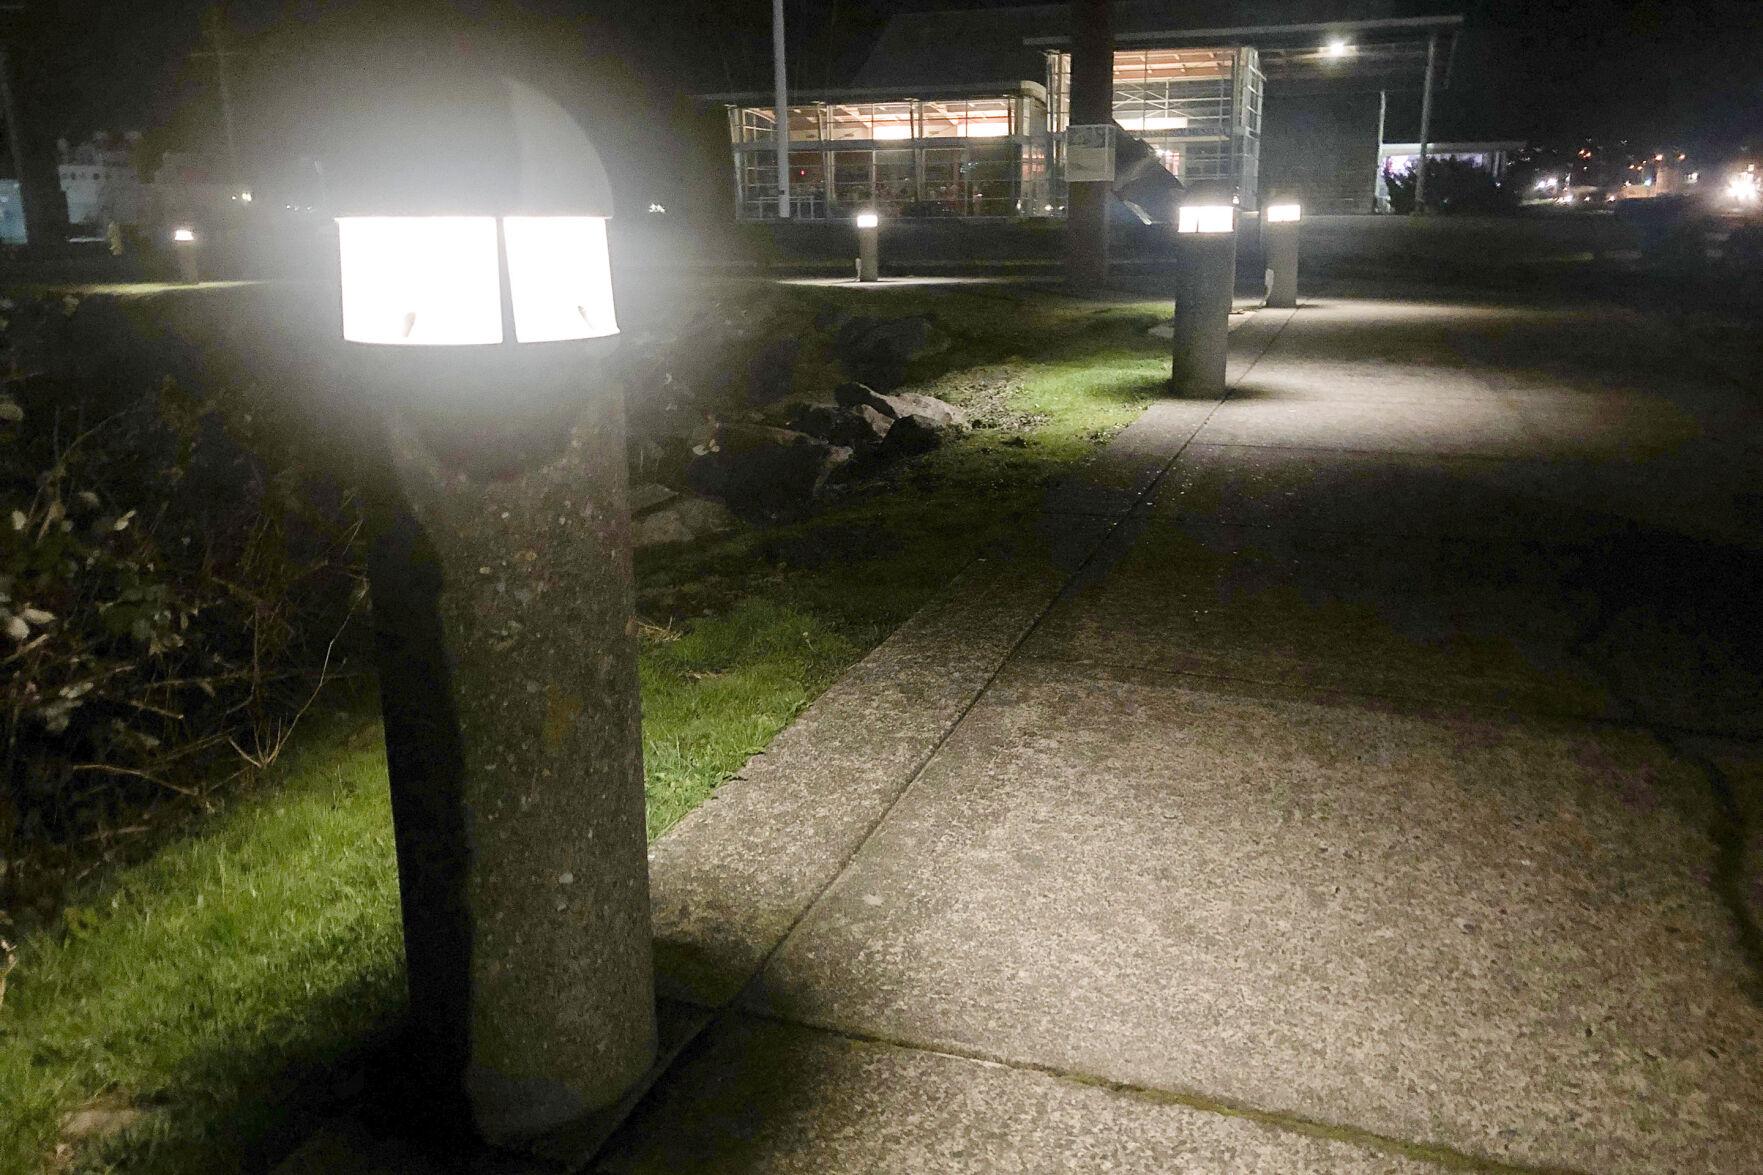 Astoria wants to expand lighting on Riverwalk